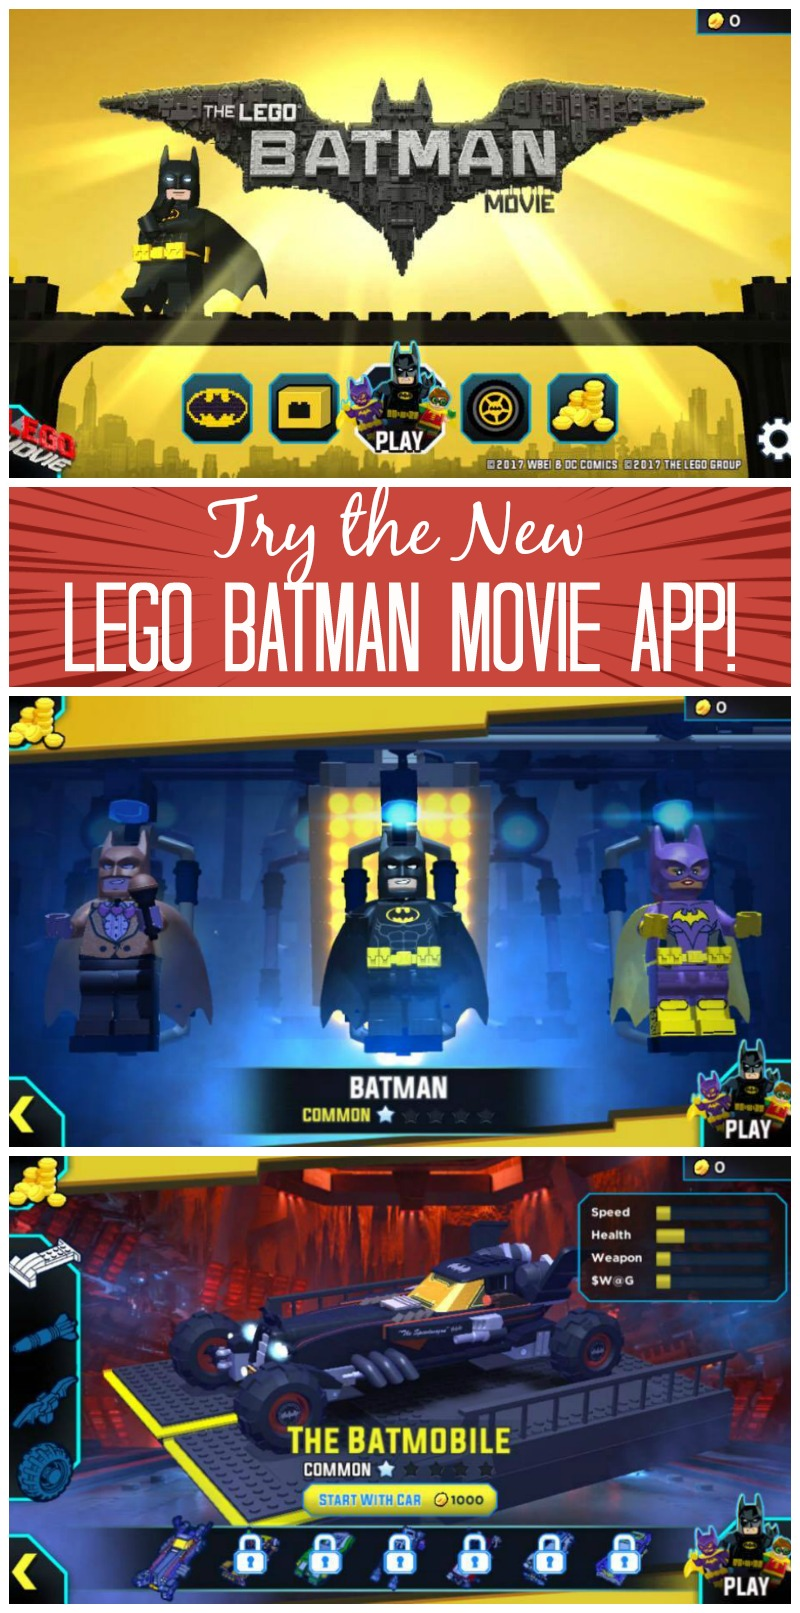 The LEGO Batman Movie App Game trailer #LEGOBatmanMovie ...